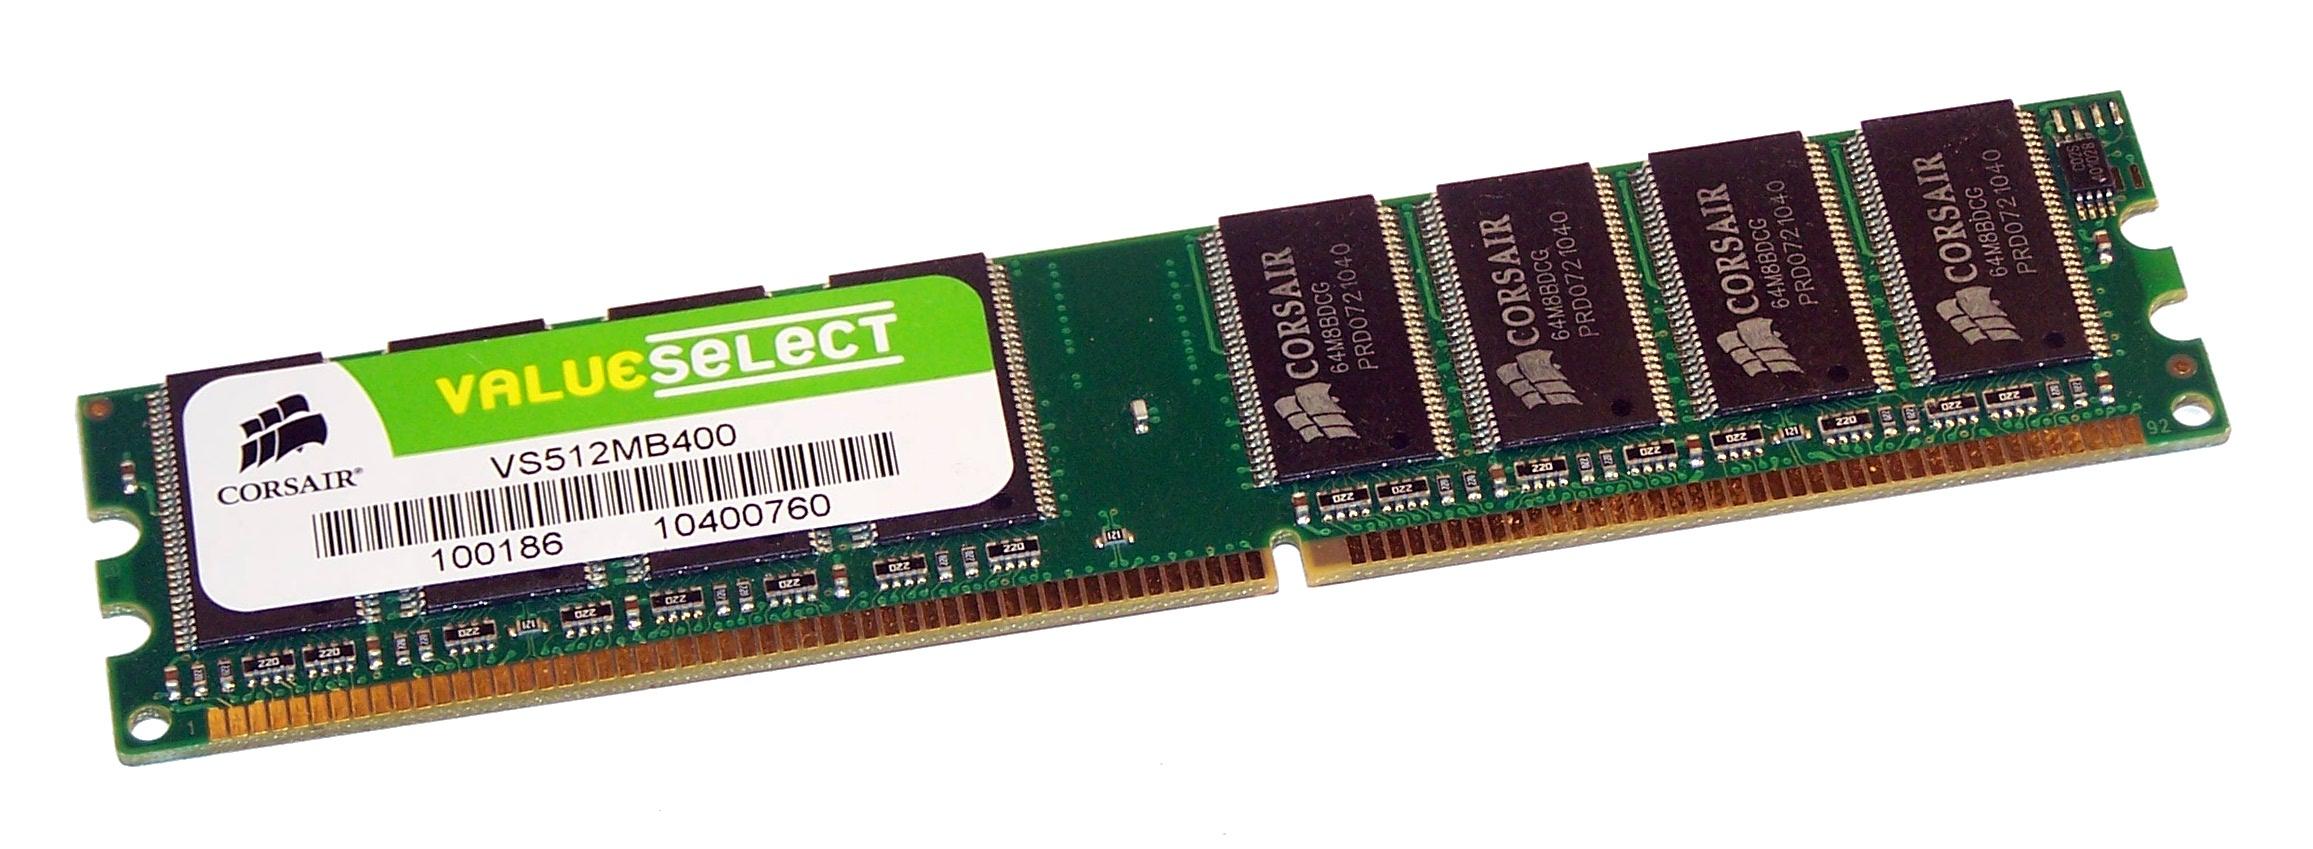 512MB DDR MEMORY RAM PC3200 NON-ECC DIMM 184-PIN 400MHZ